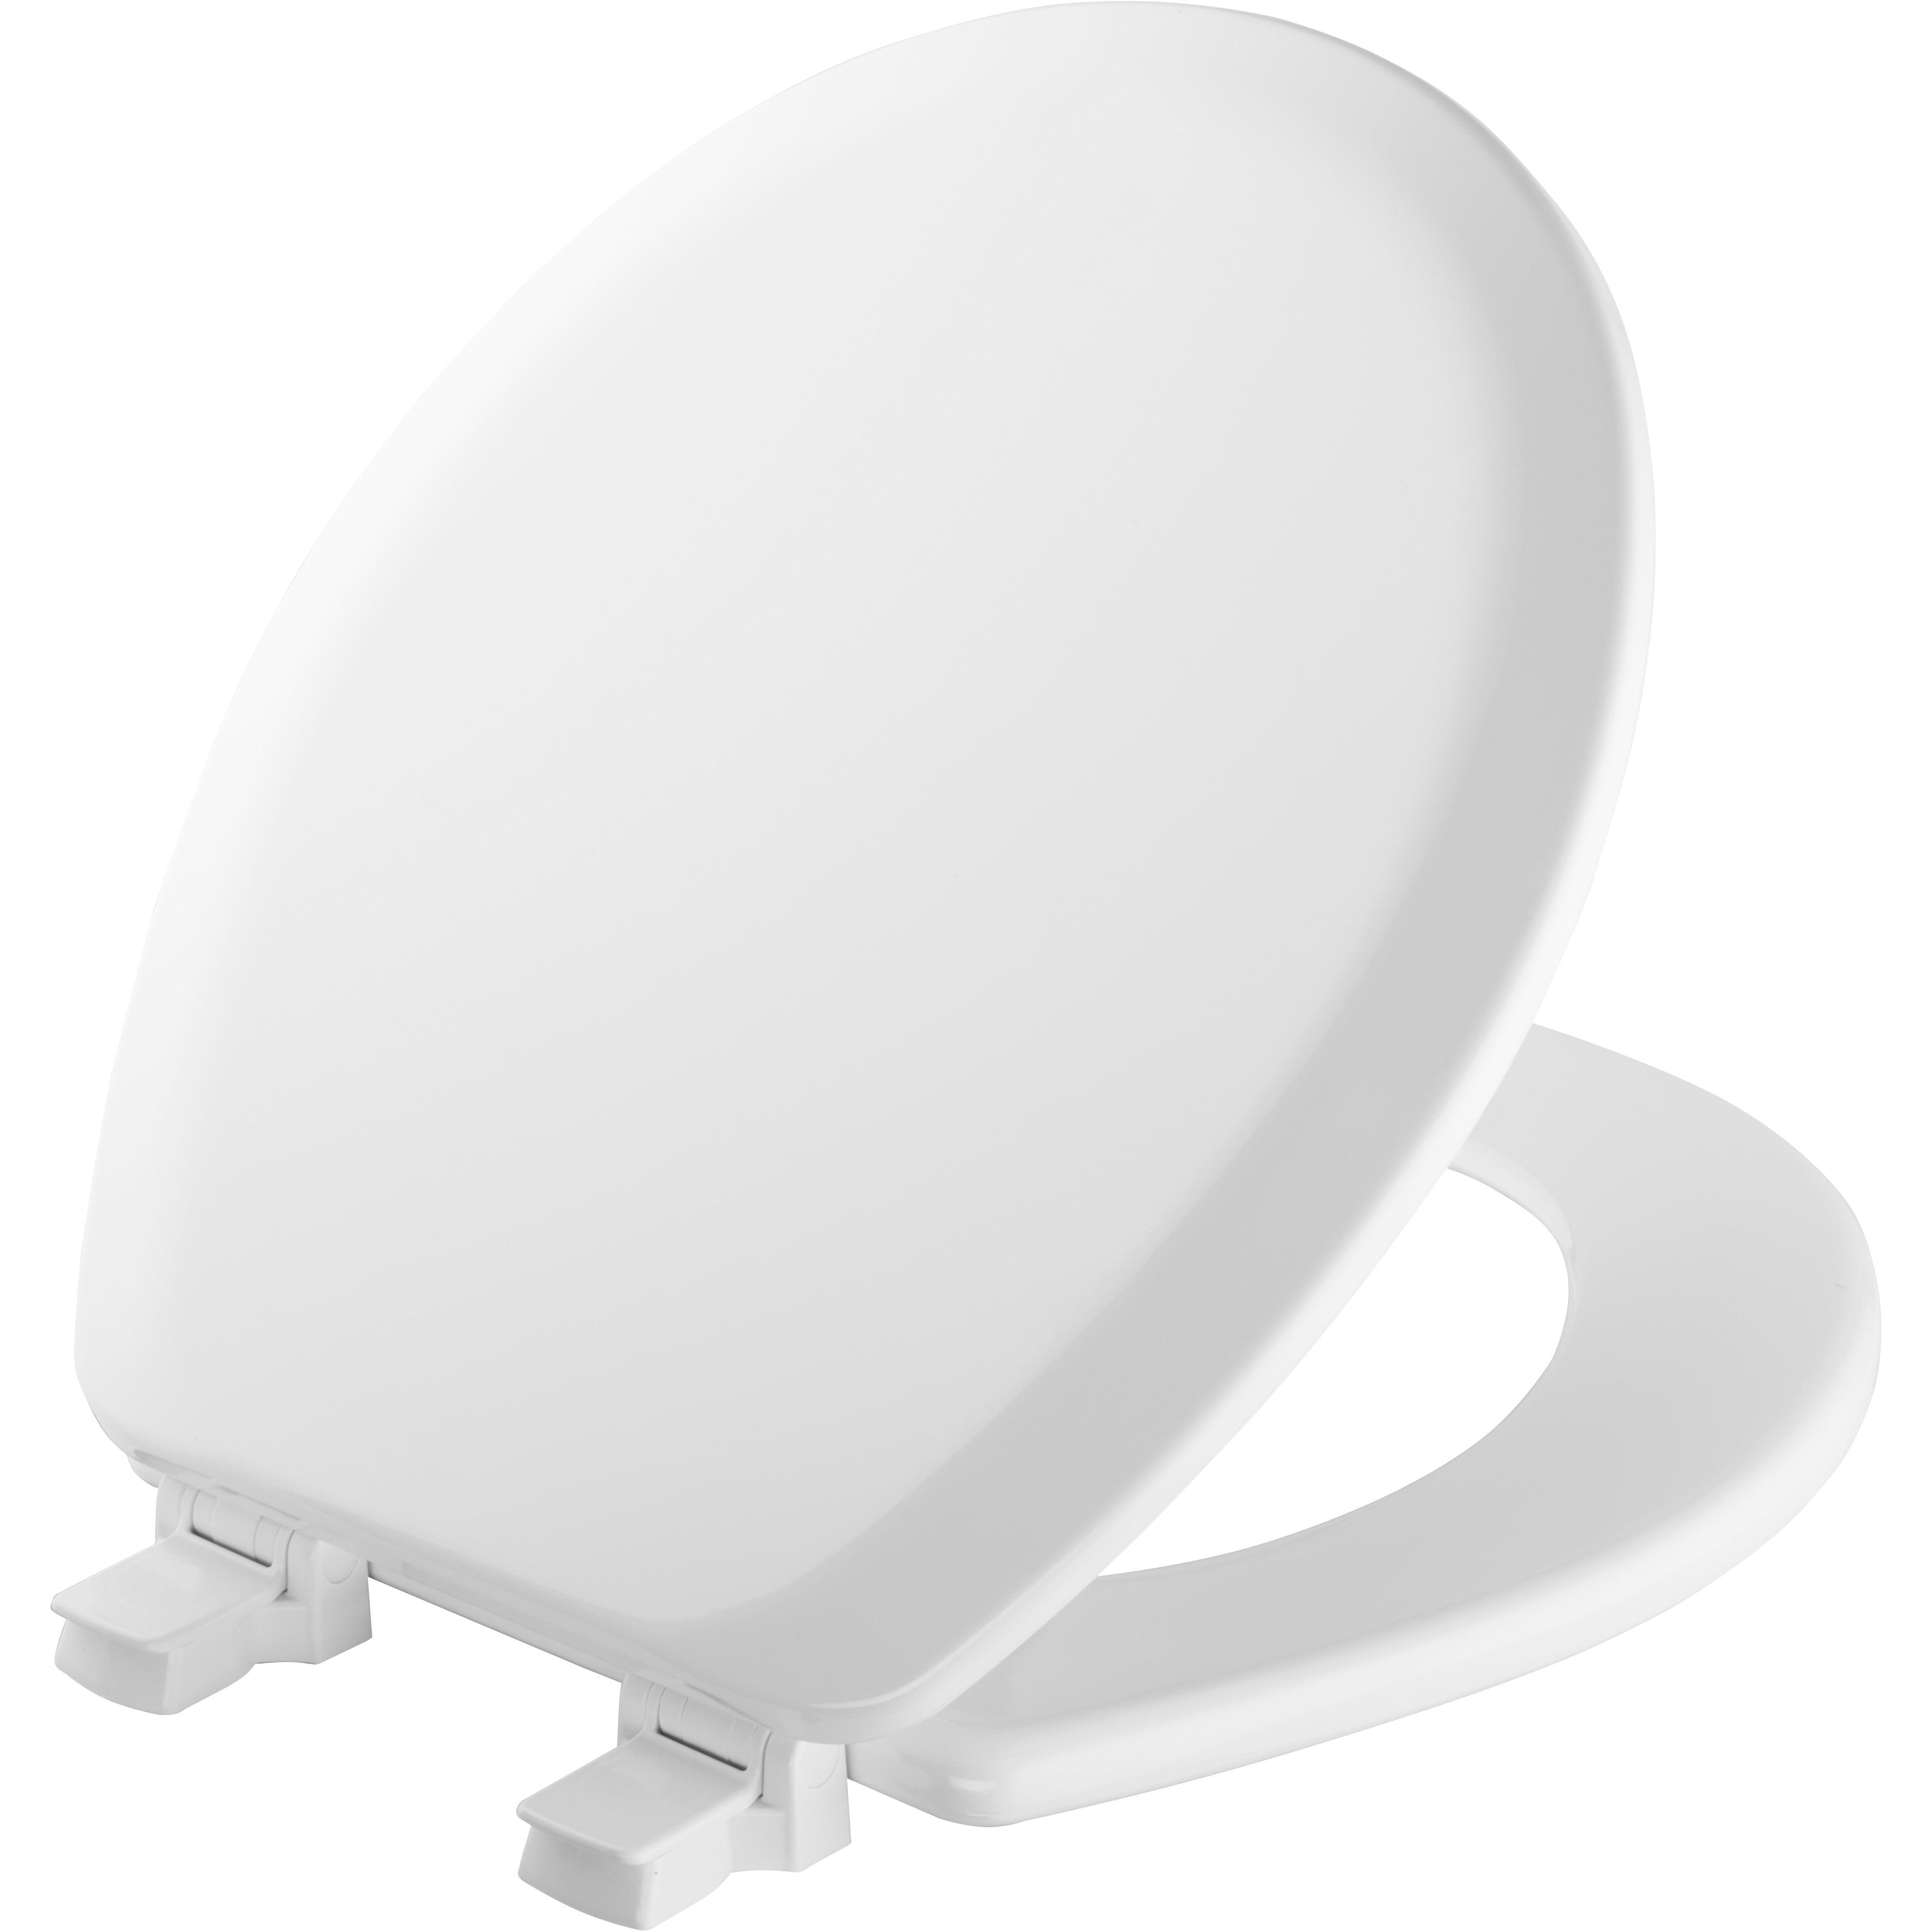 Mayfair 92C Plastic Toilet Seat